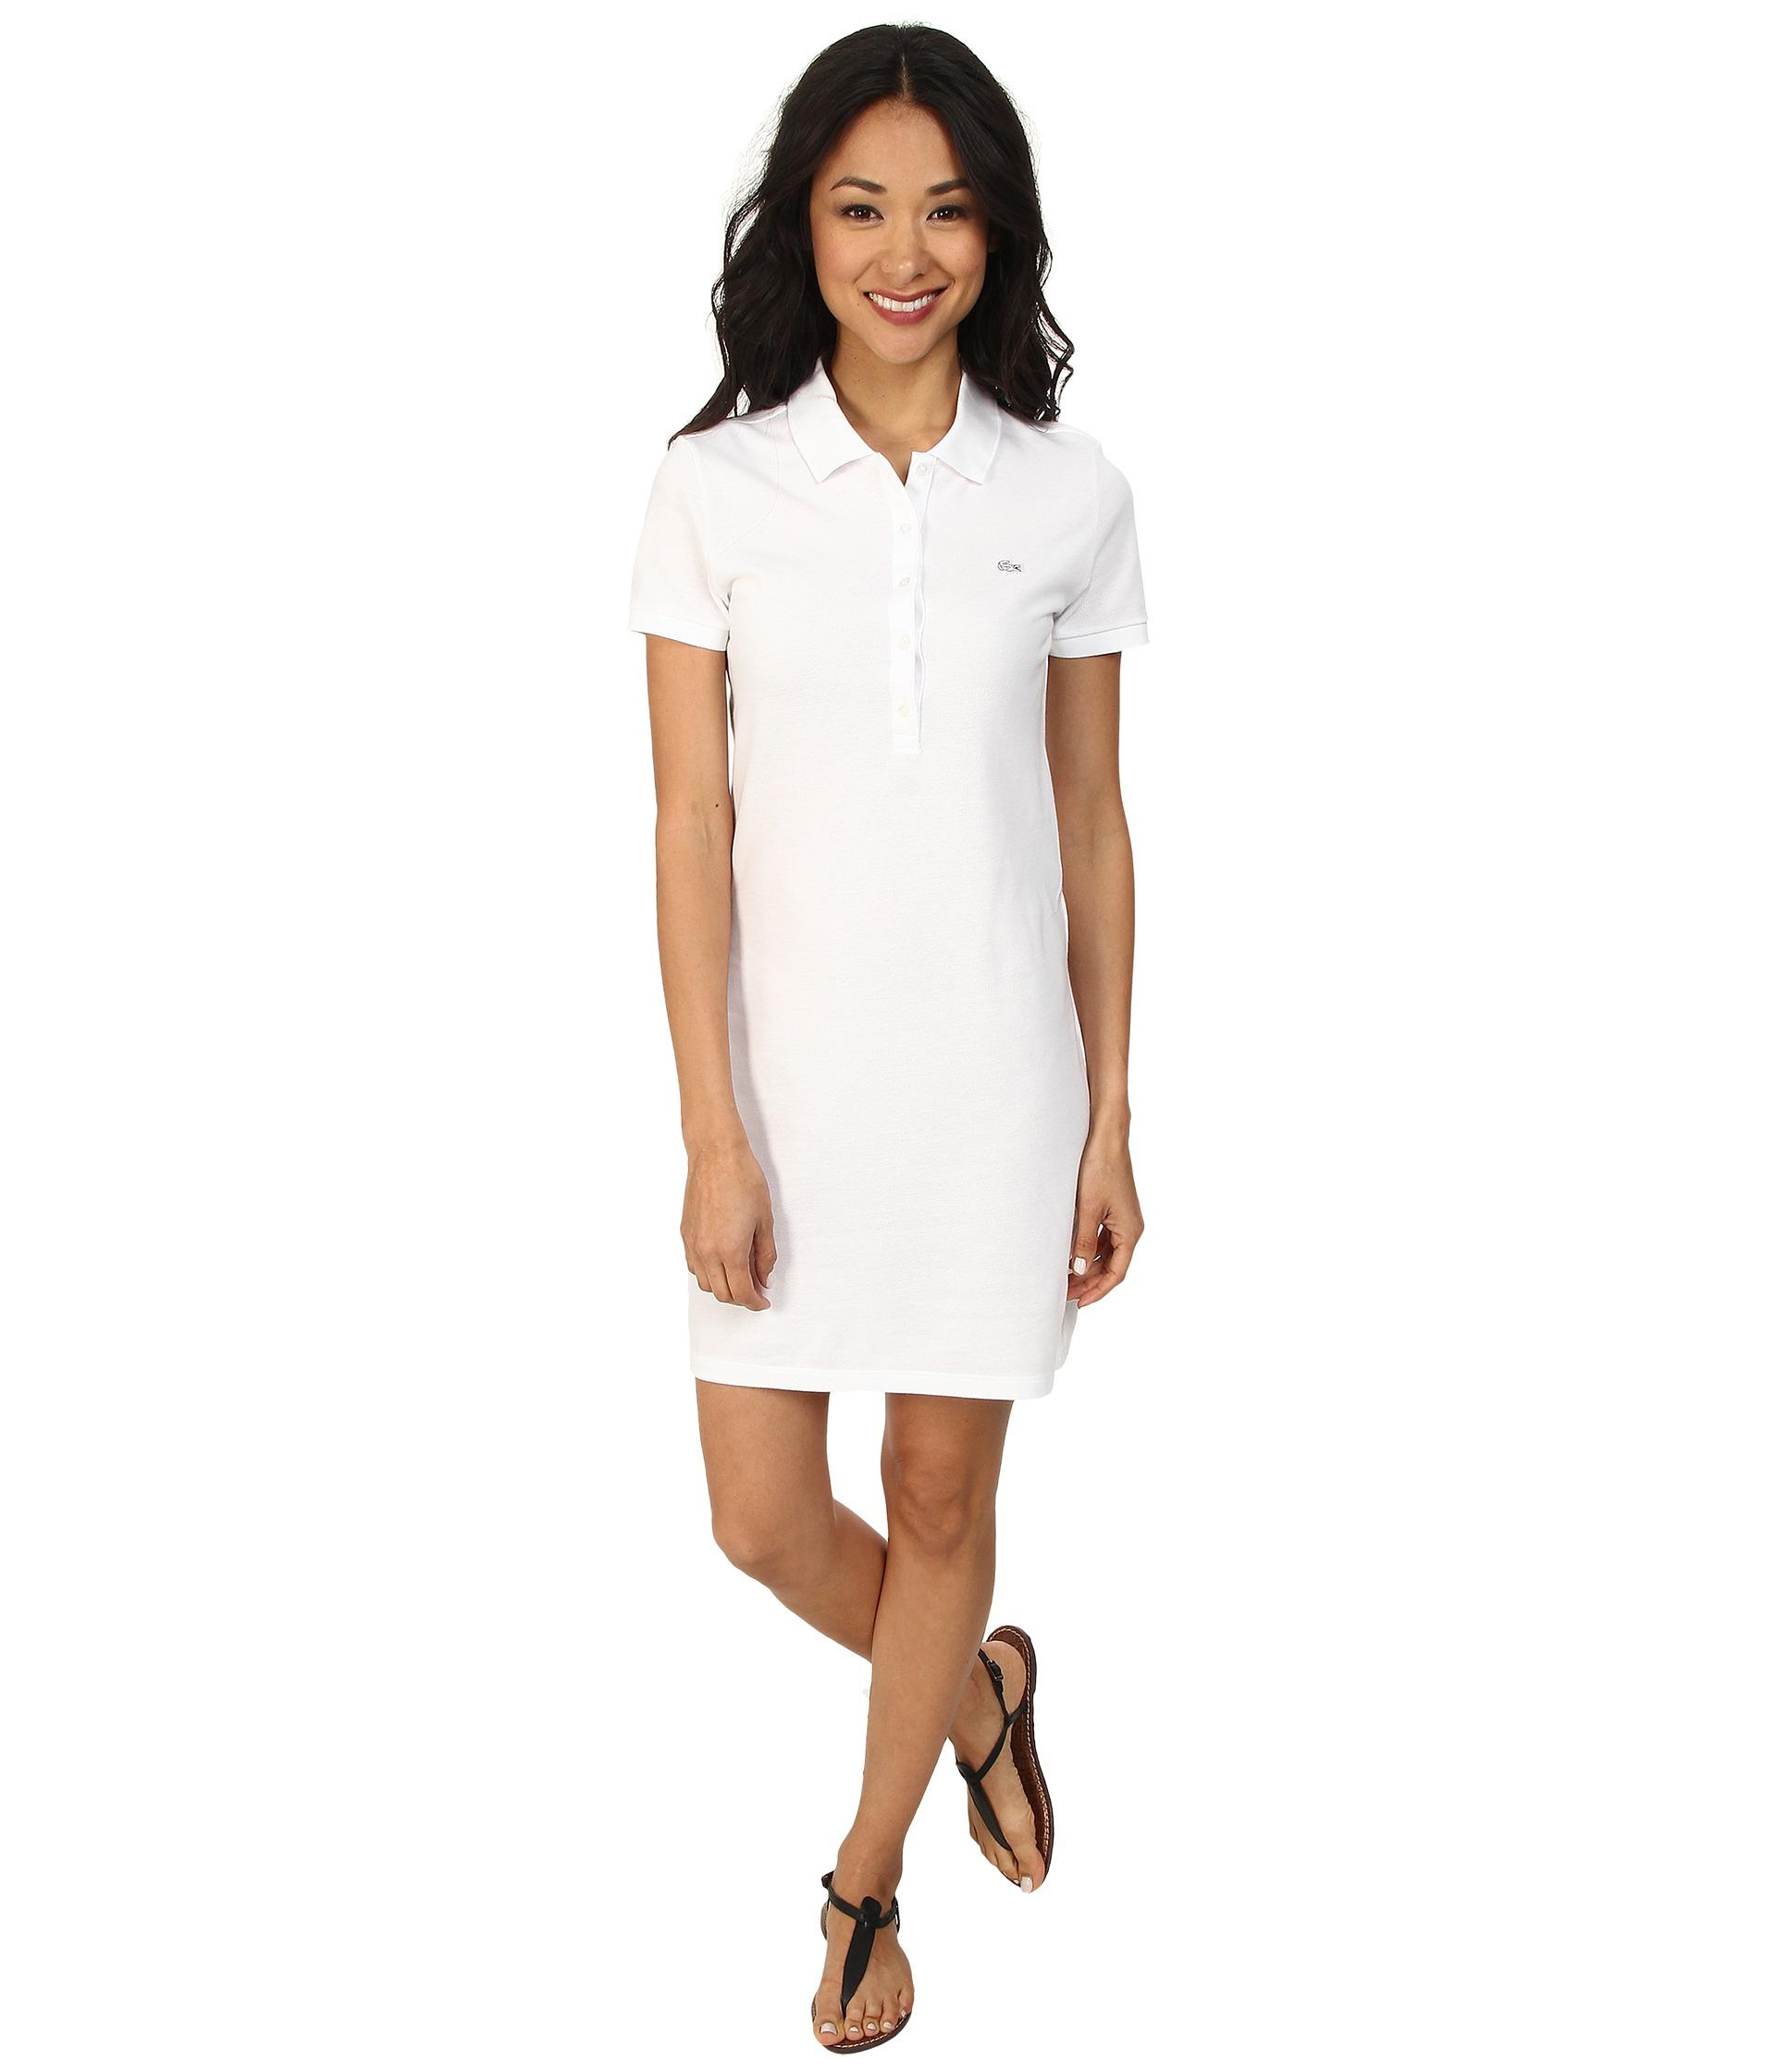 f7ea6e1e3c794e Lyst - Lacoste Short Sleeve Classic Pique Polo Dress in White